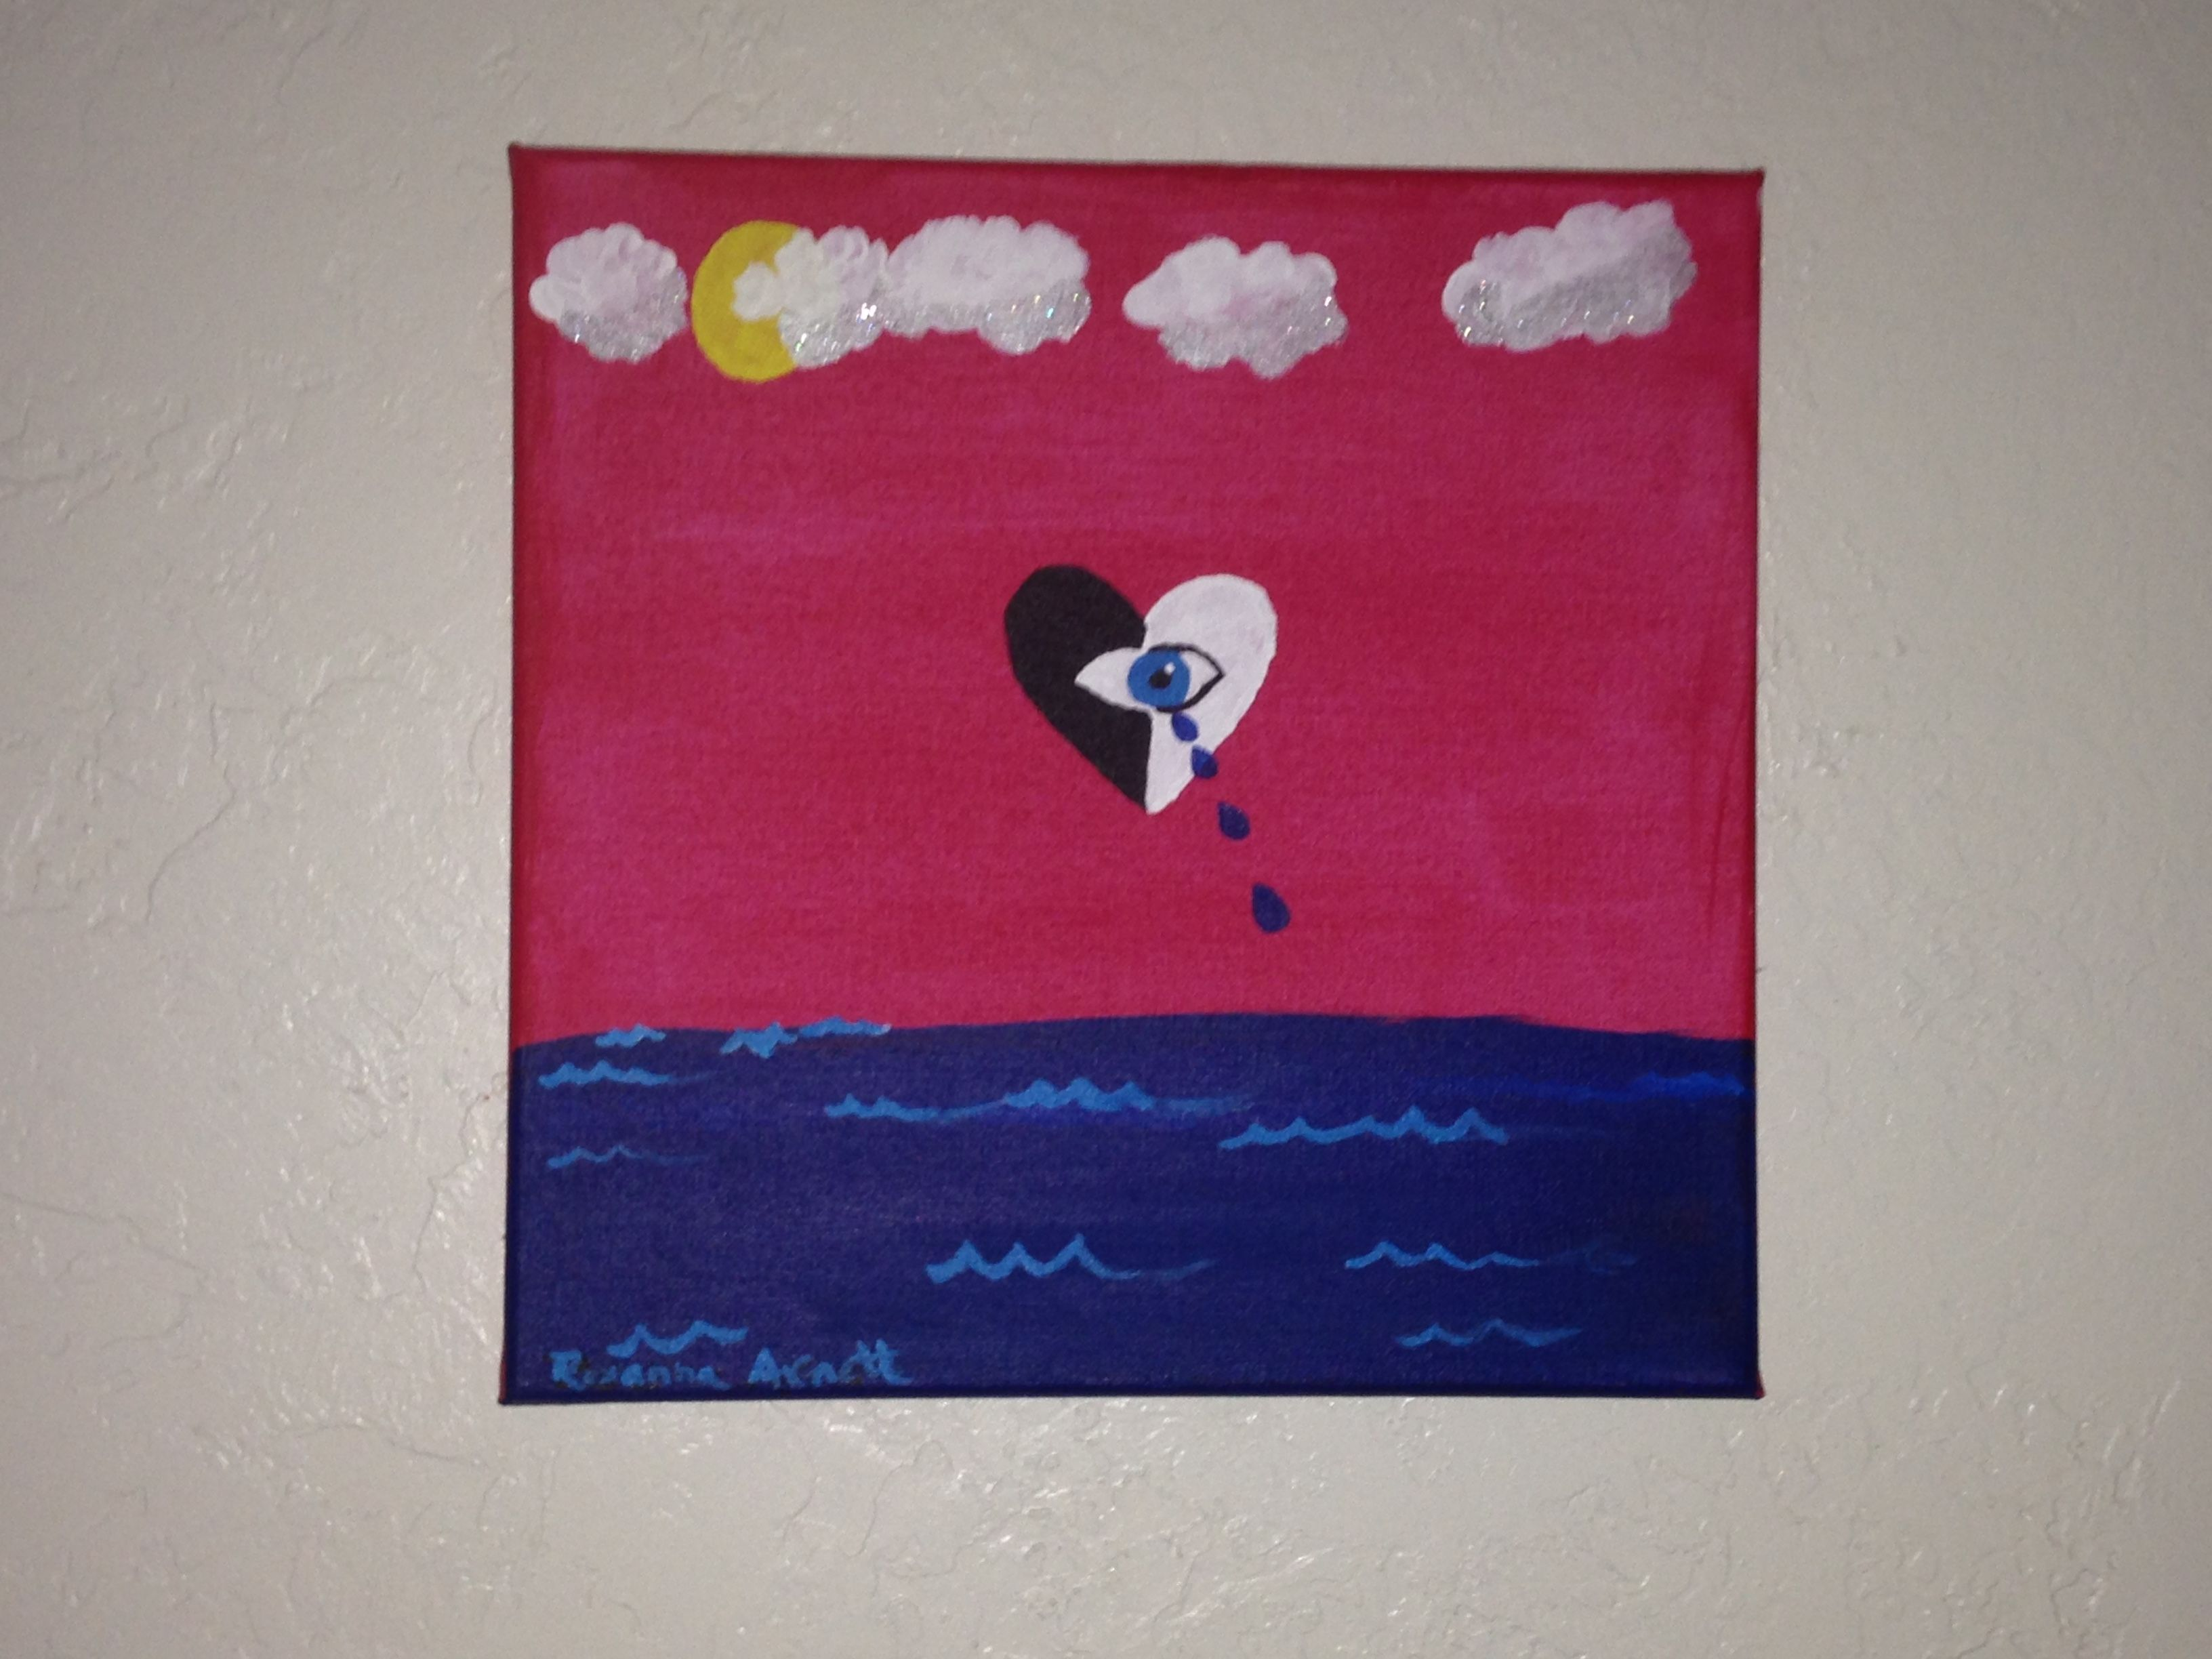 Weeping Yin Yang   Acrylic of canvas   By: Roxanna Arnett 2015